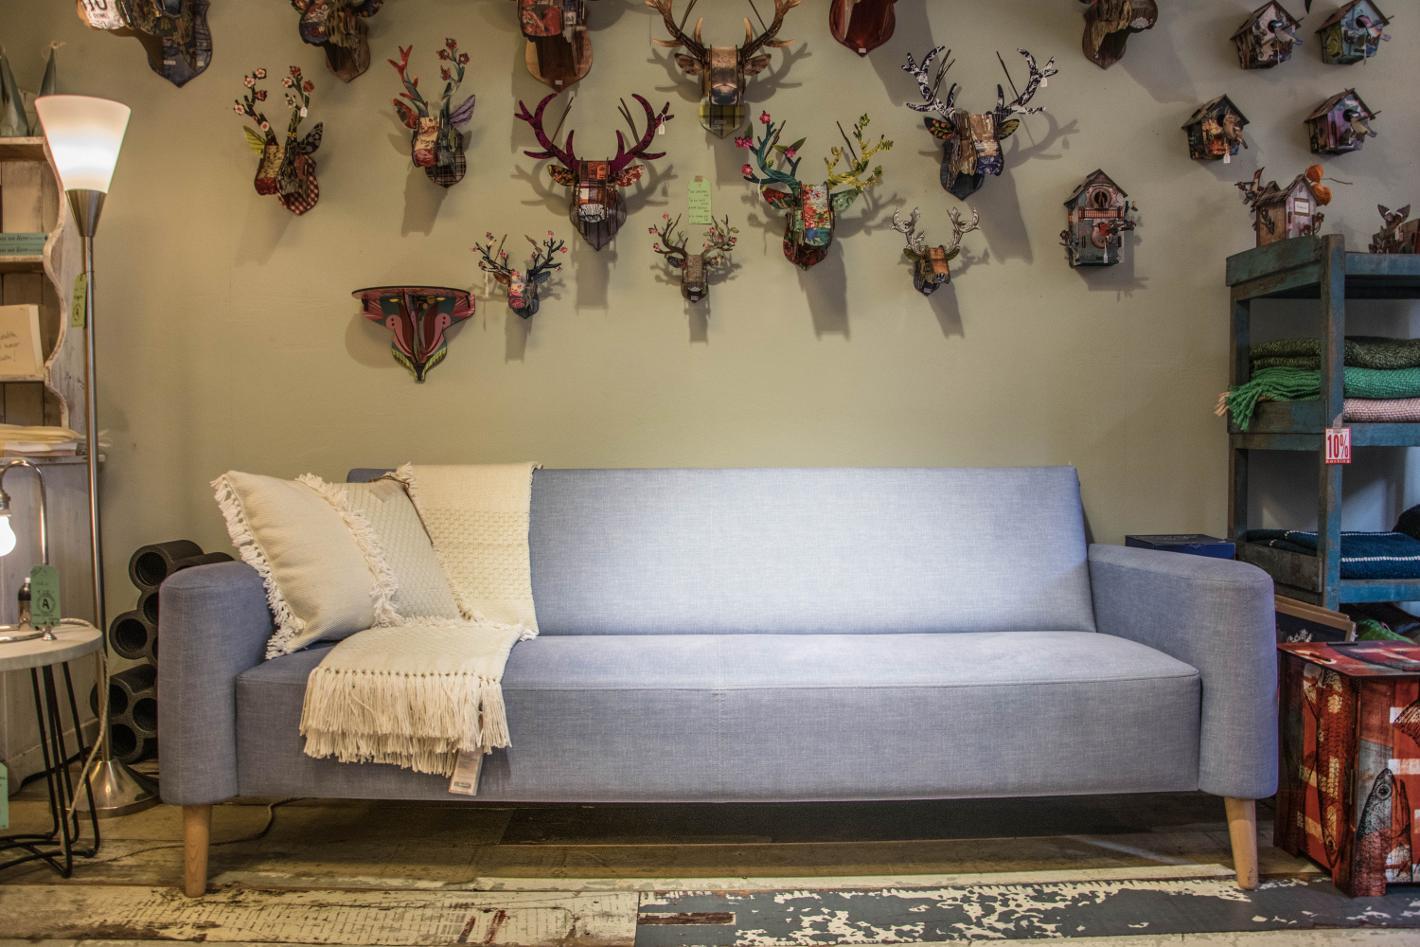 Kado Wonen Alkmaar Apart Living woonwinkel meubels kado